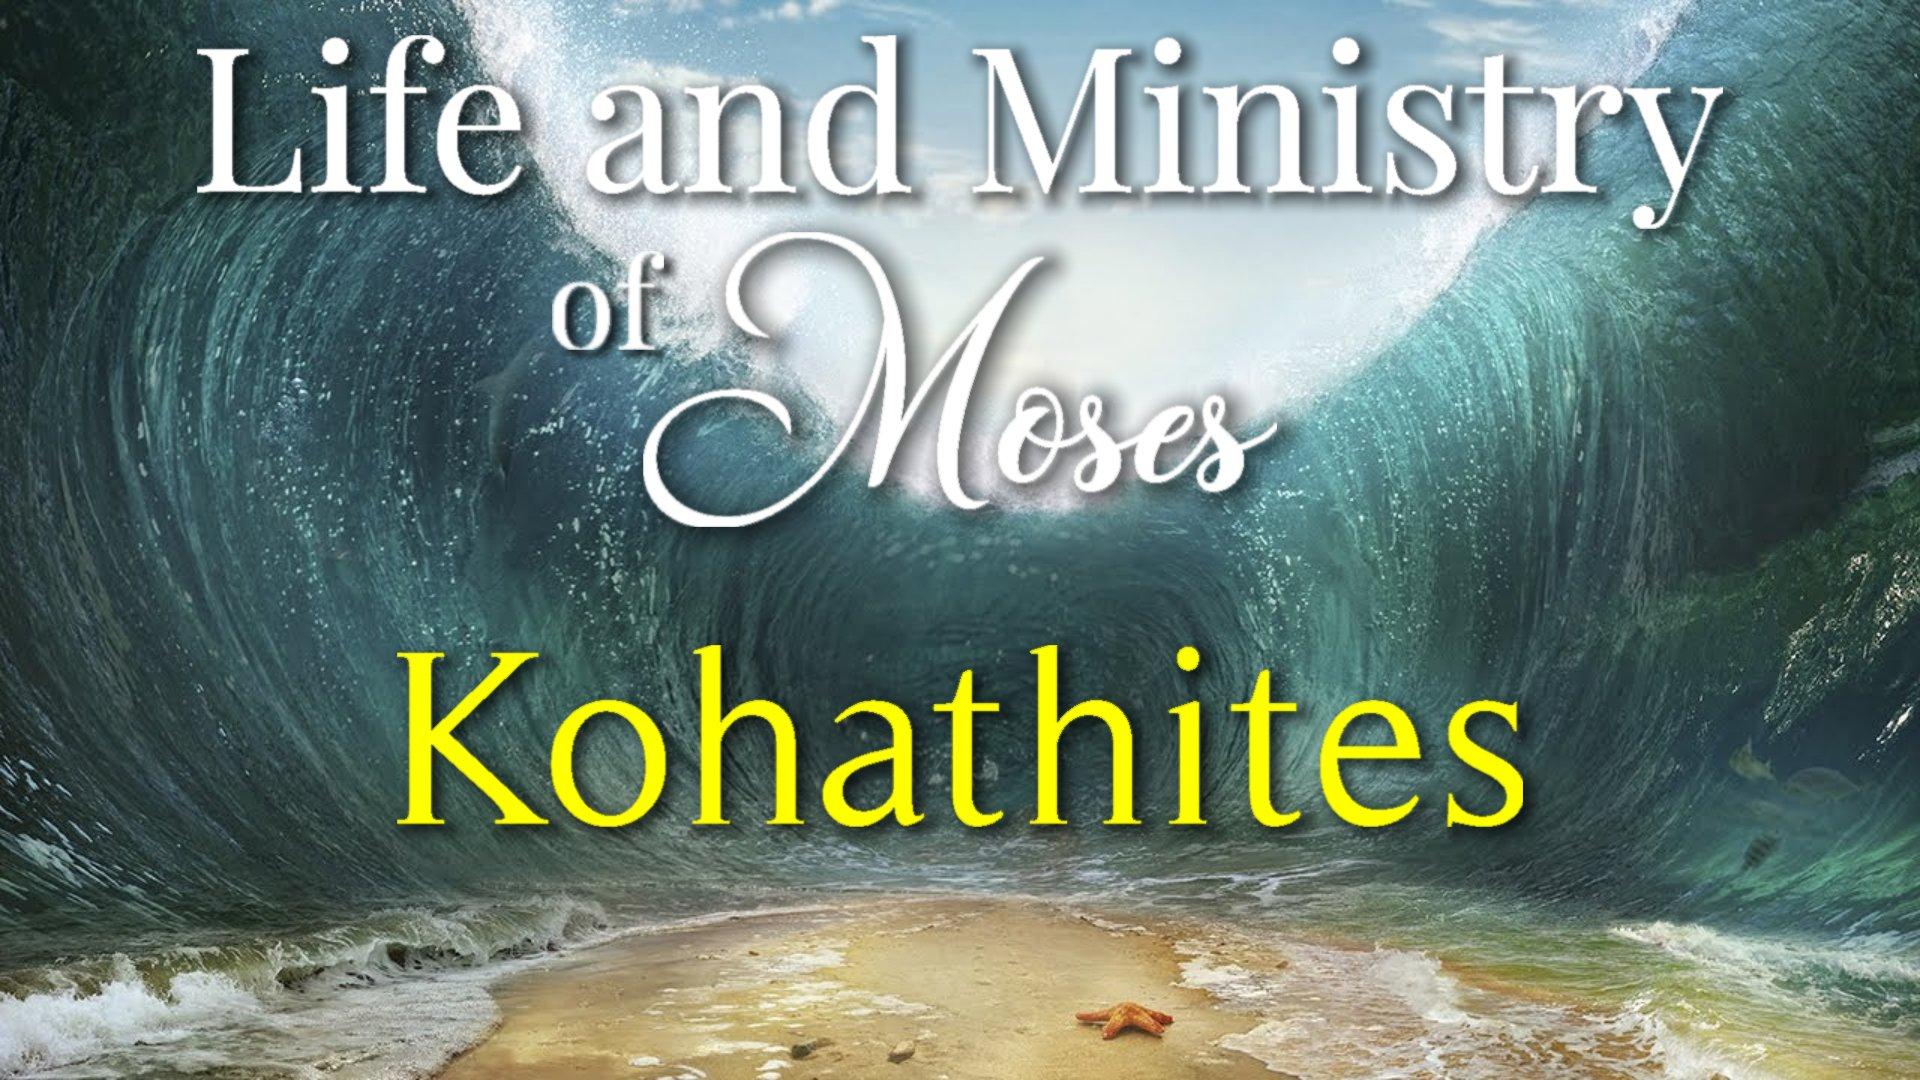 37 The Kohathites / Korah's Rebellion